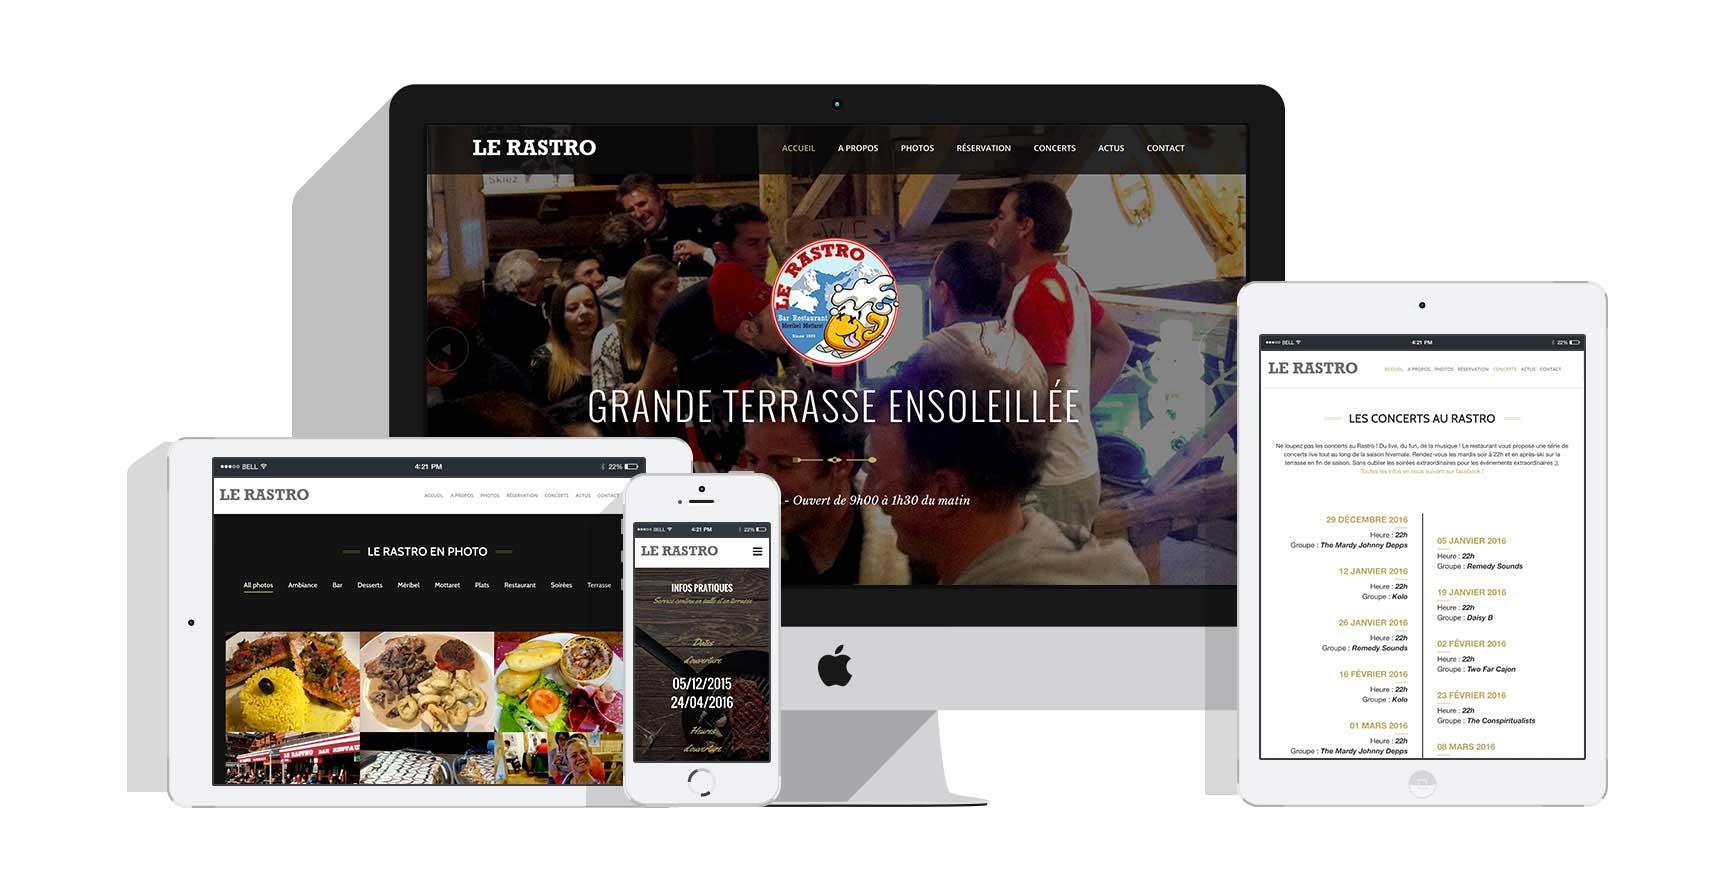 portfolio-rastro-florence-borrel-flobo-design-graphique-infographie-webdesign-savoie-tarentaise-meribel-menuires-courchevel